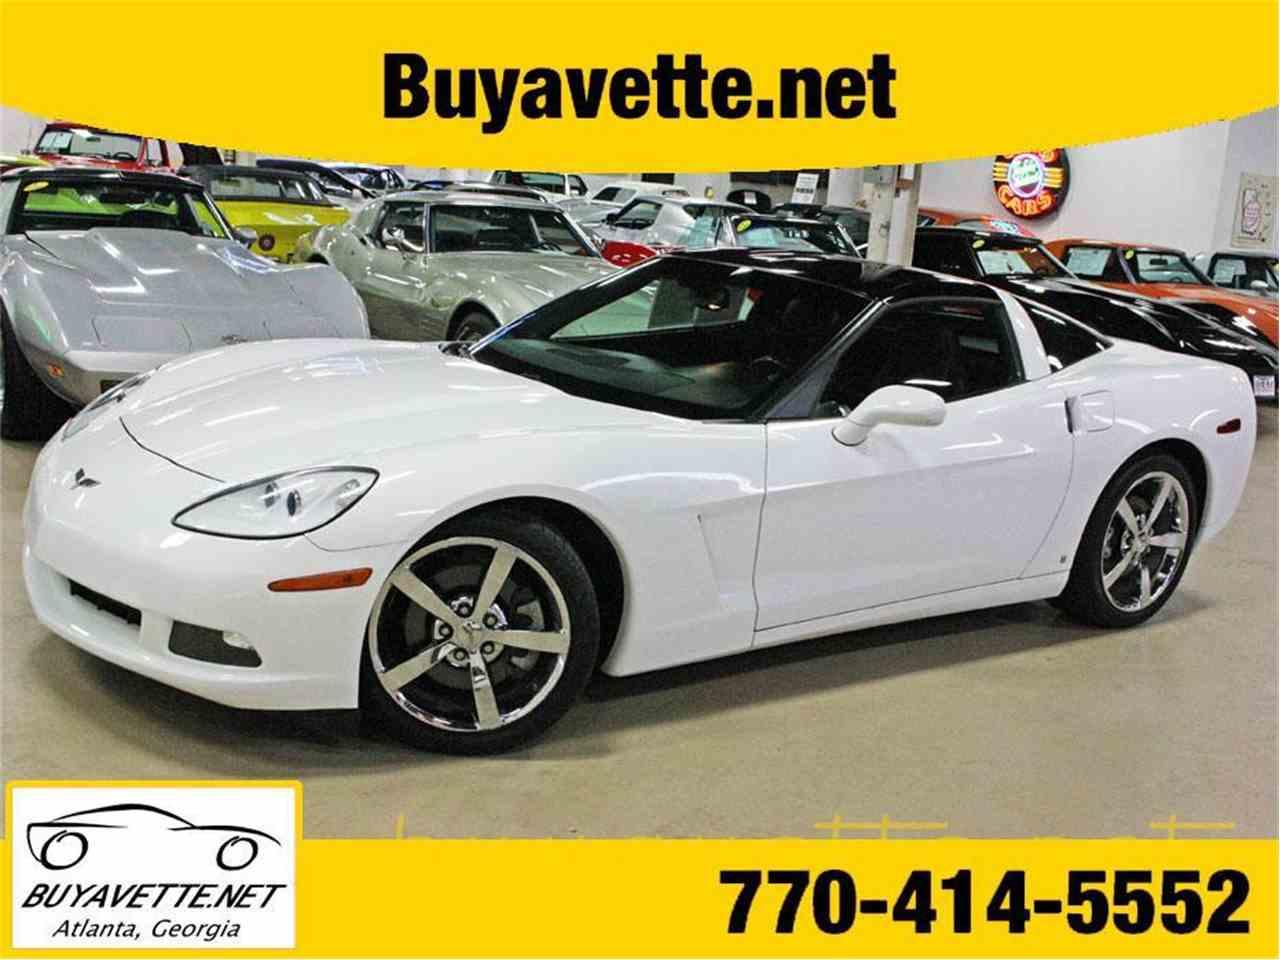 Large Picture of '09 Corvette located in Atlanta Georgia - $24,999.00 - LUPJ